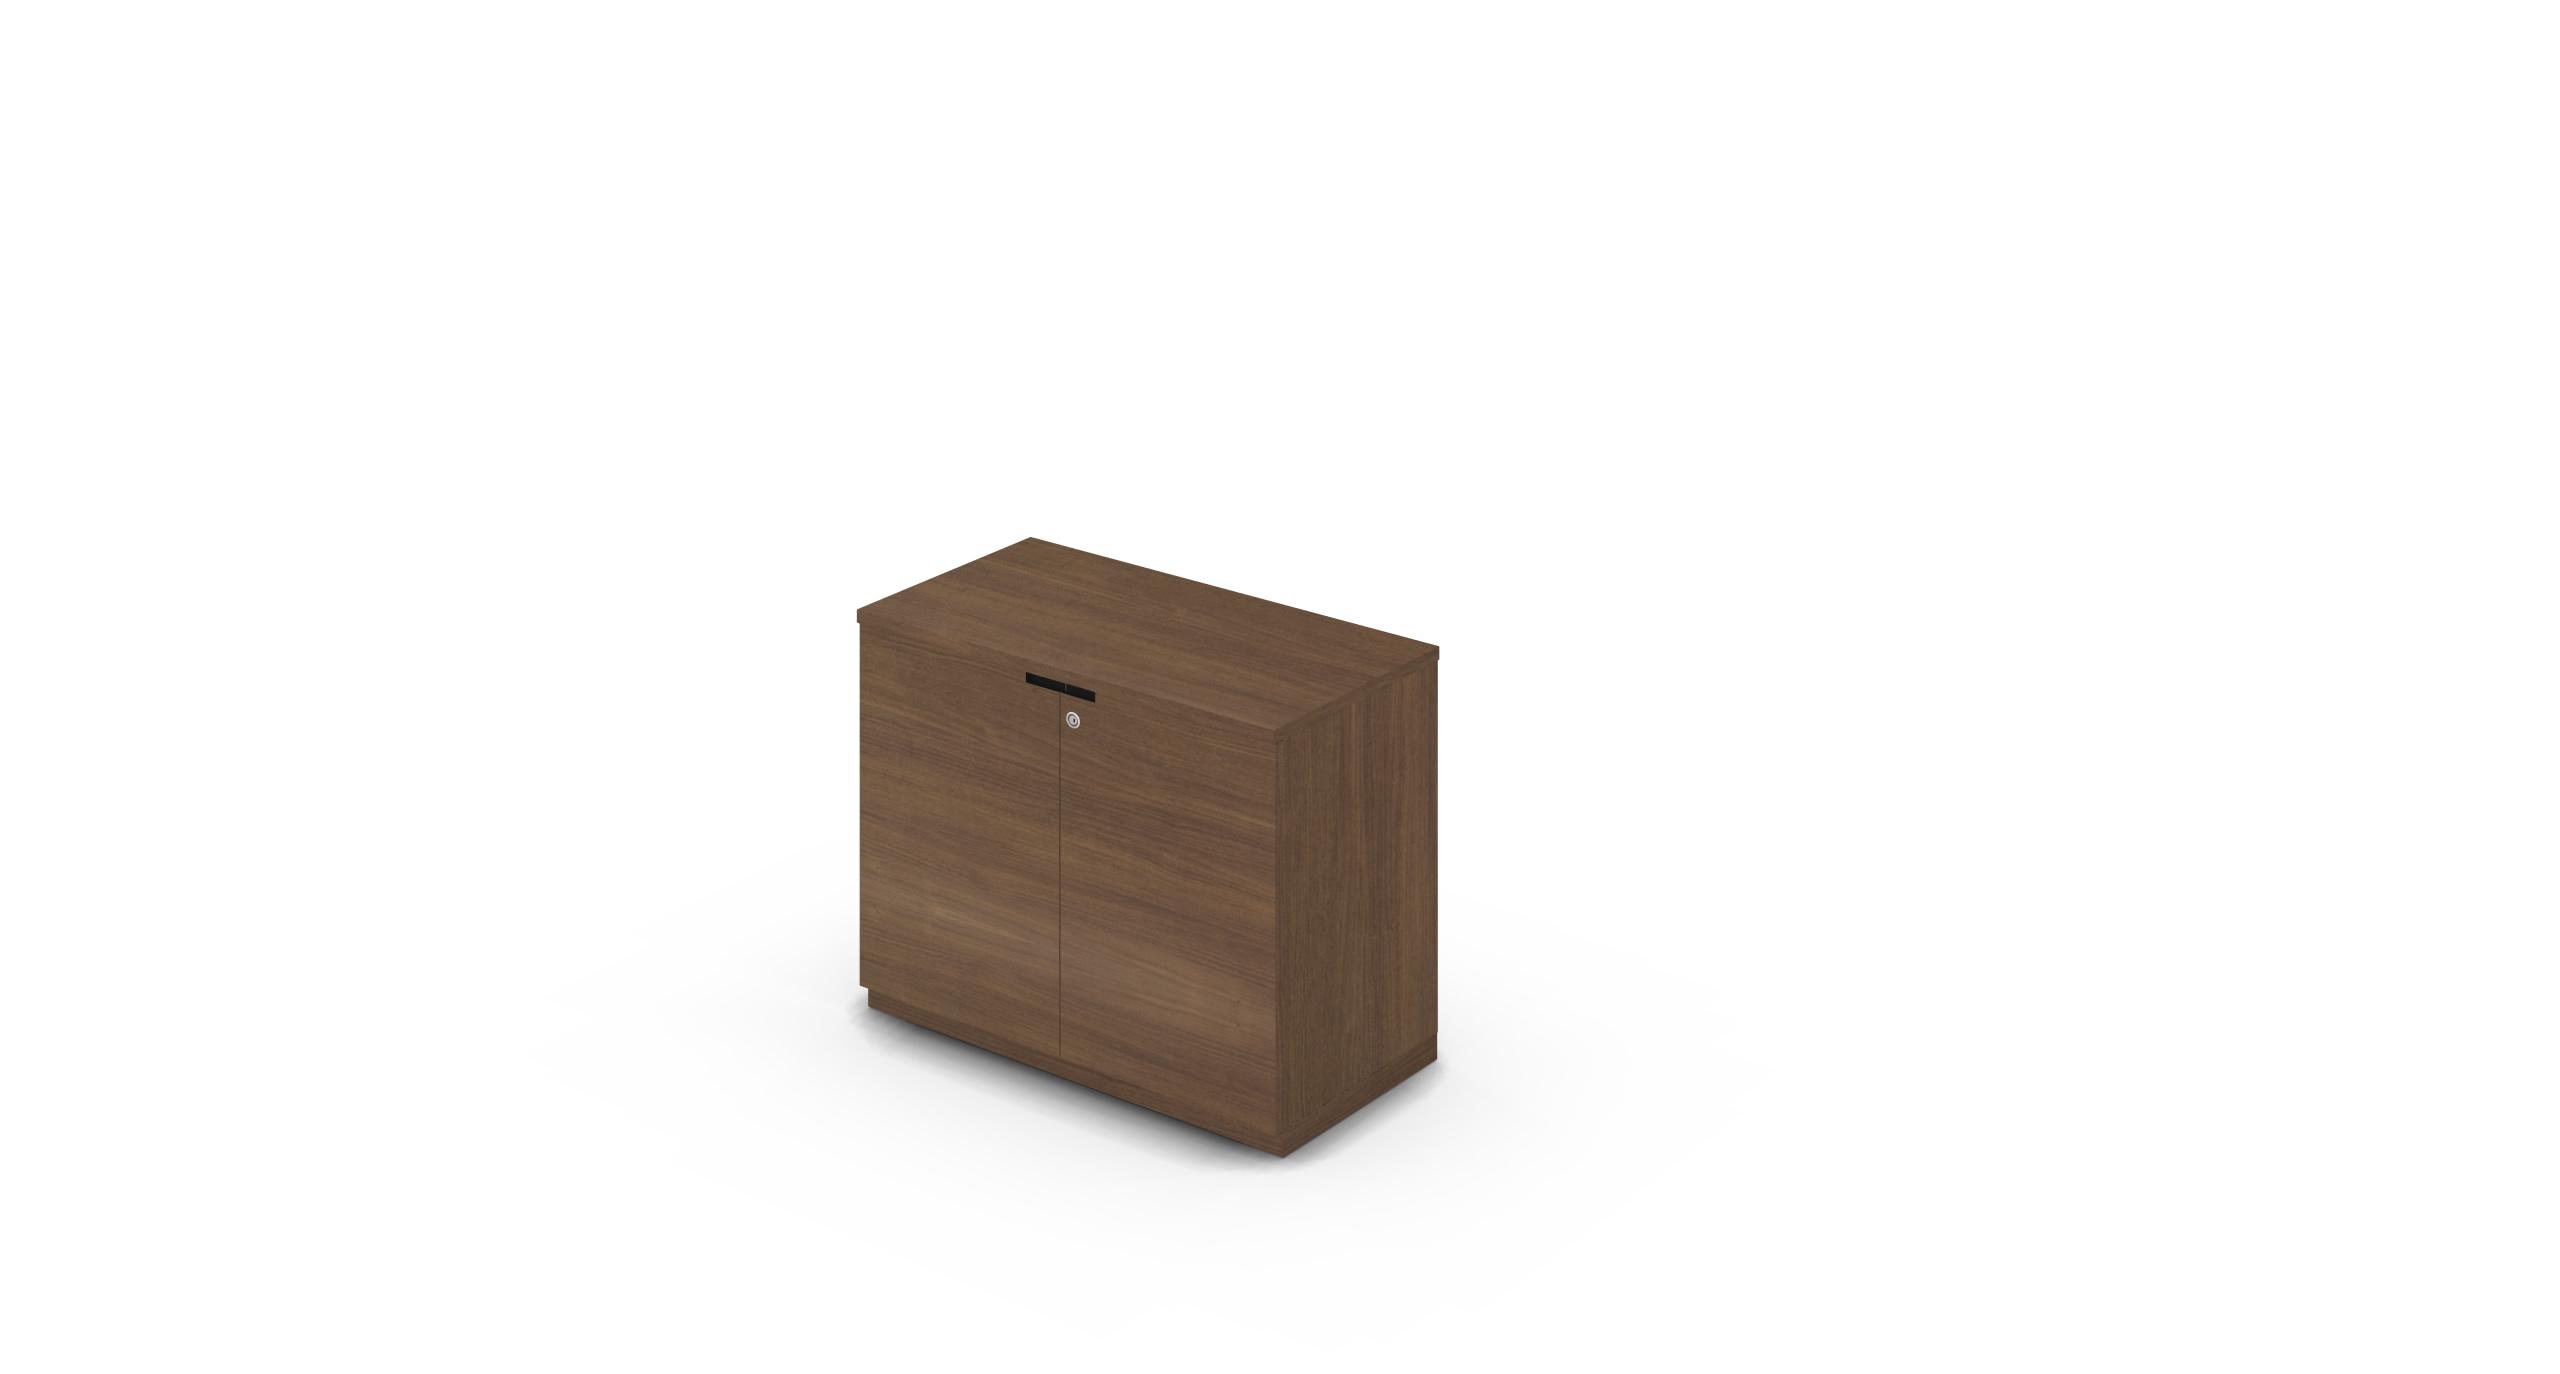 Cabinet_900x450x775_HD_Walnut_CutOut_WithCylinder